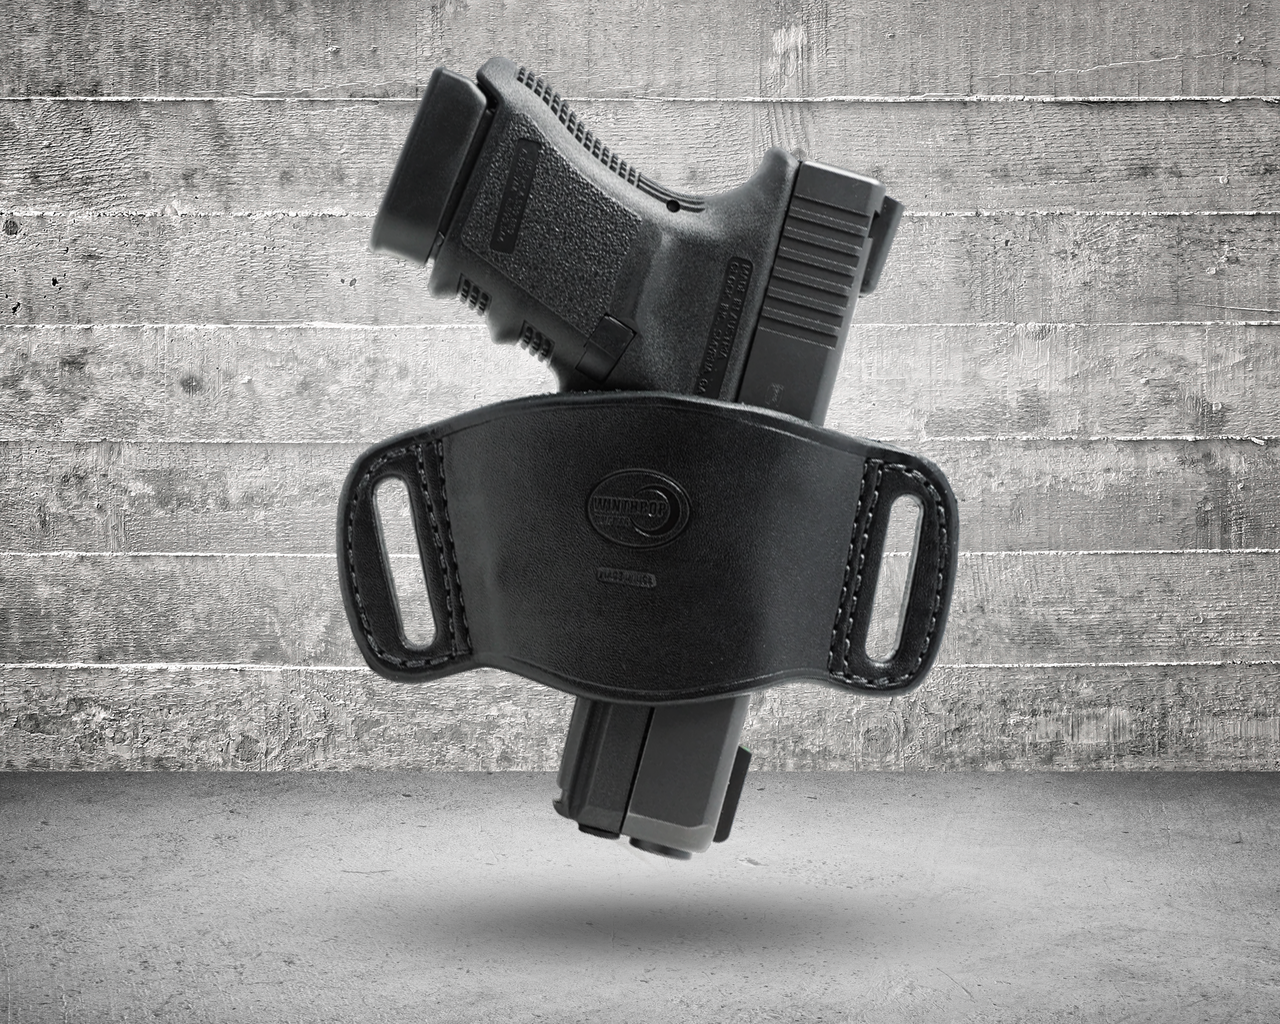 Winthrop Ambidextrous OWB Belt Slide Holster Pocket Size Pistols